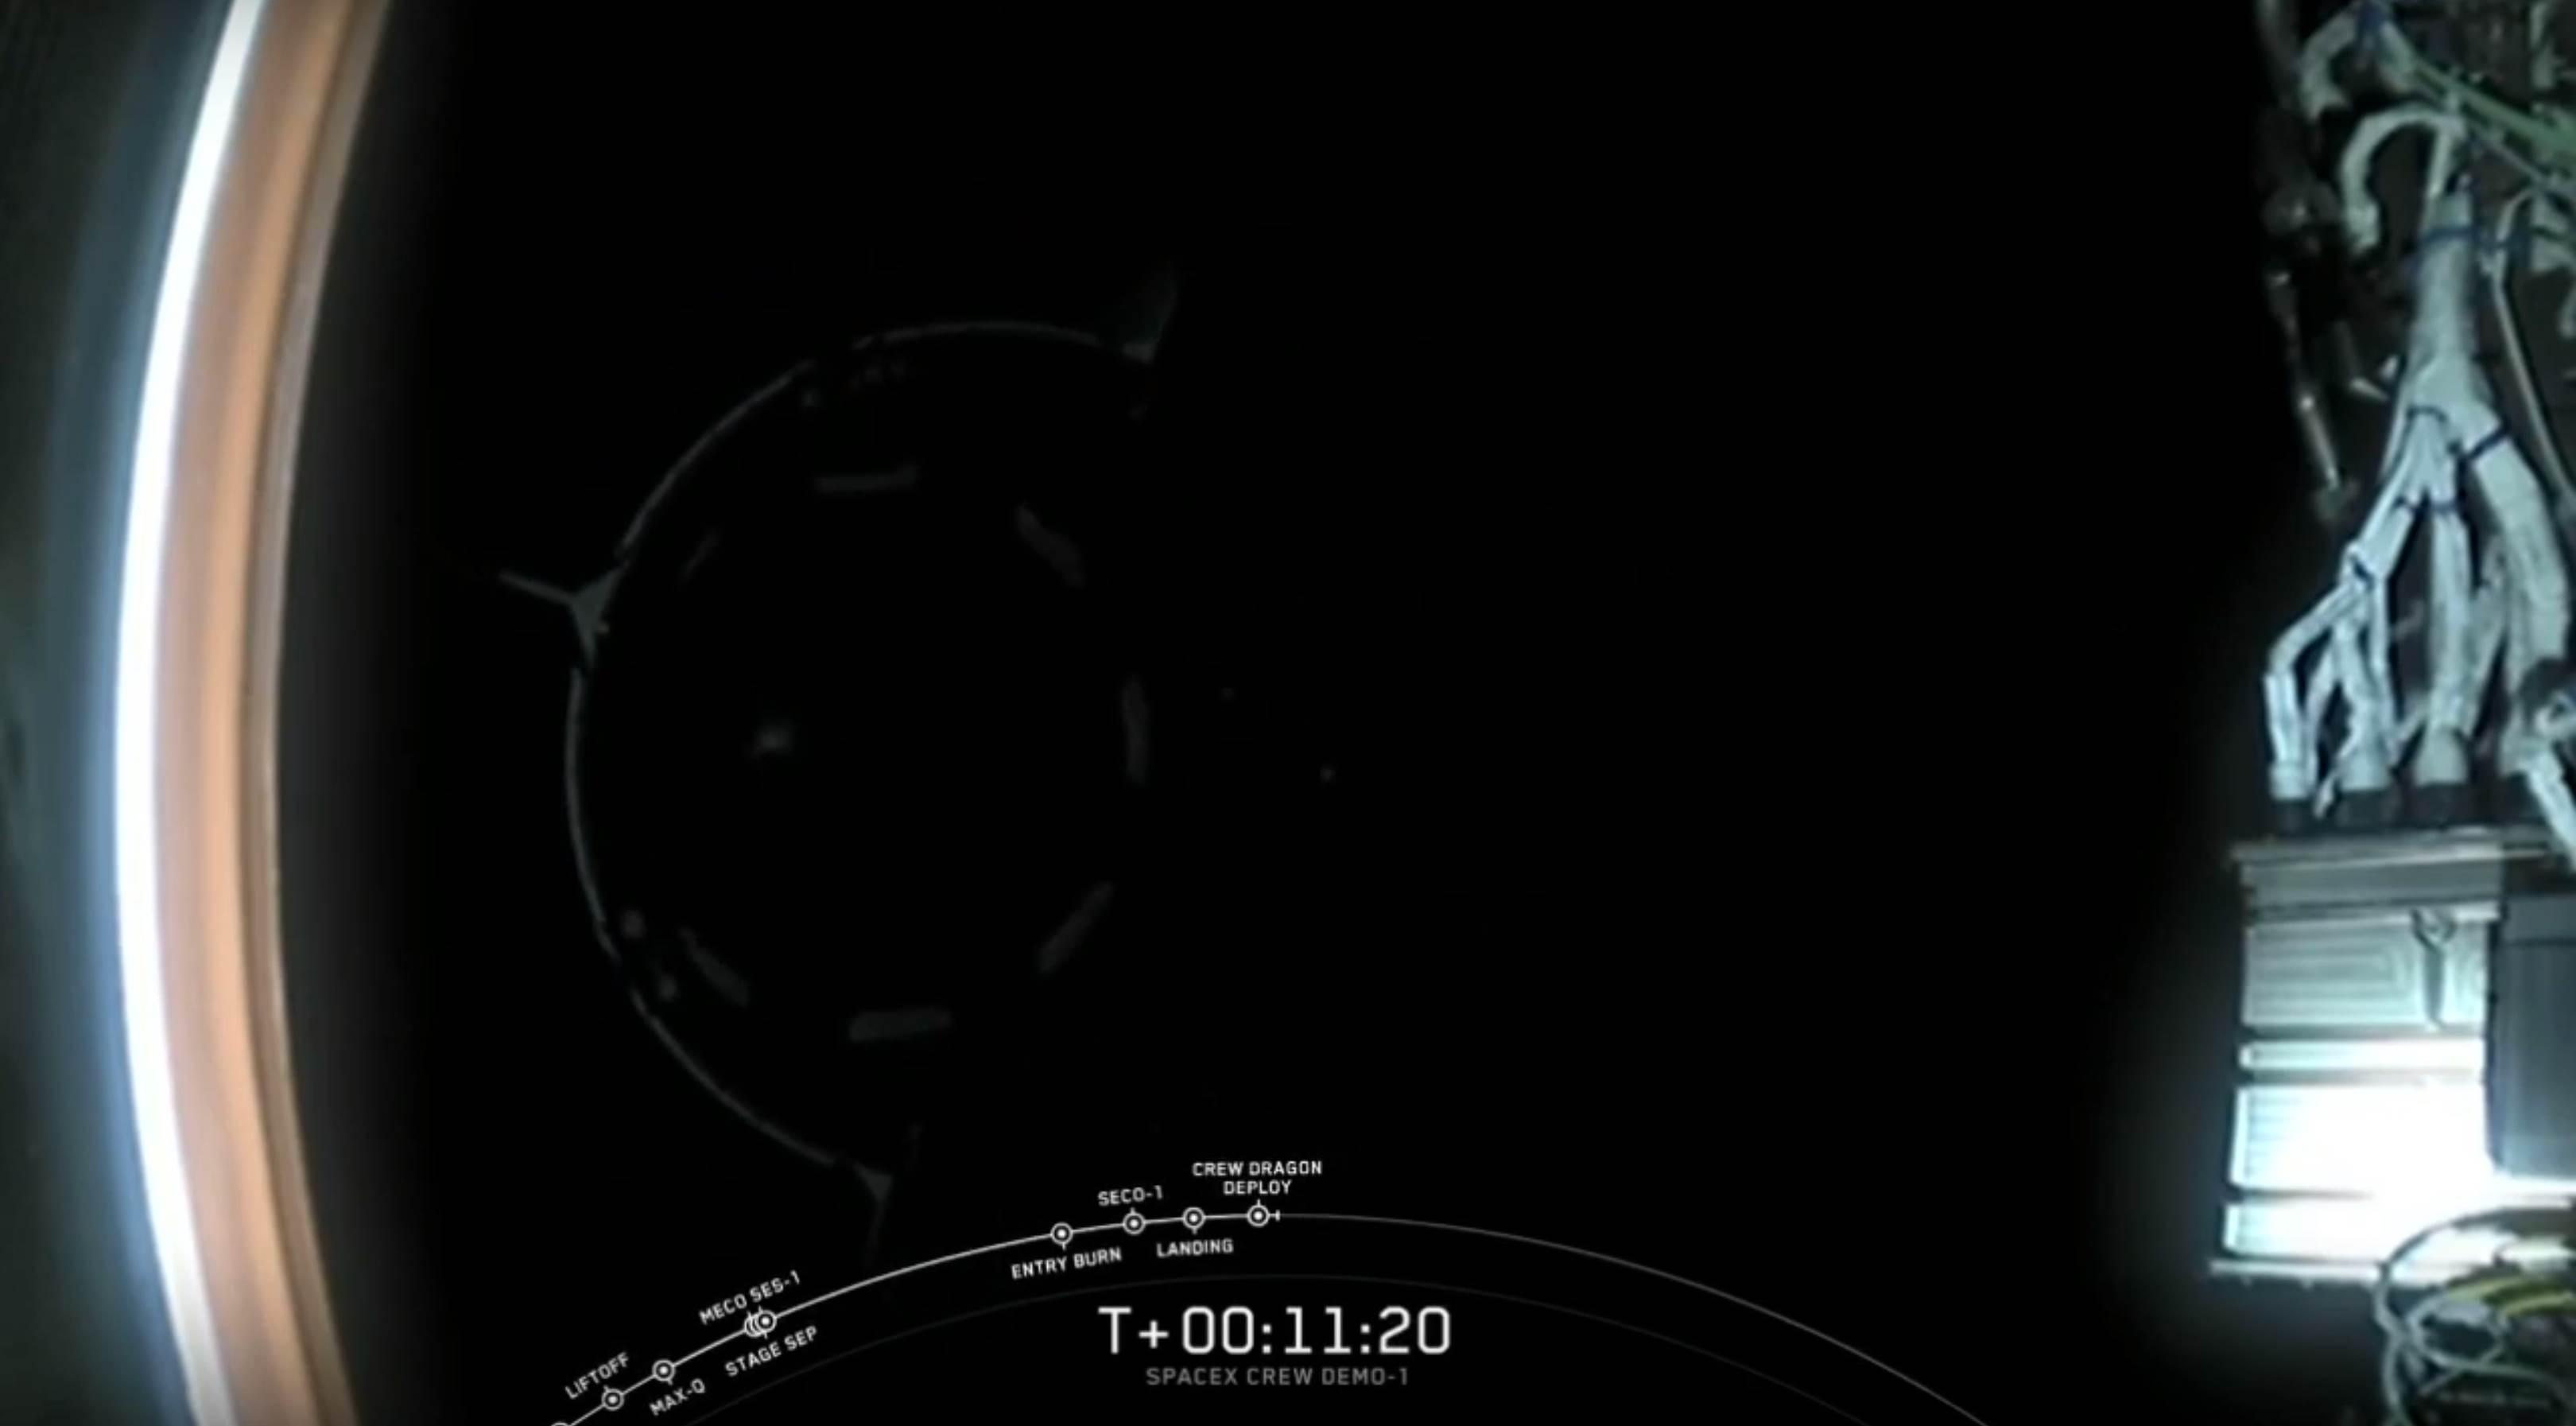 DM-1 Crew Dragon Falcon 9 B1051 deploy (SpaceX)